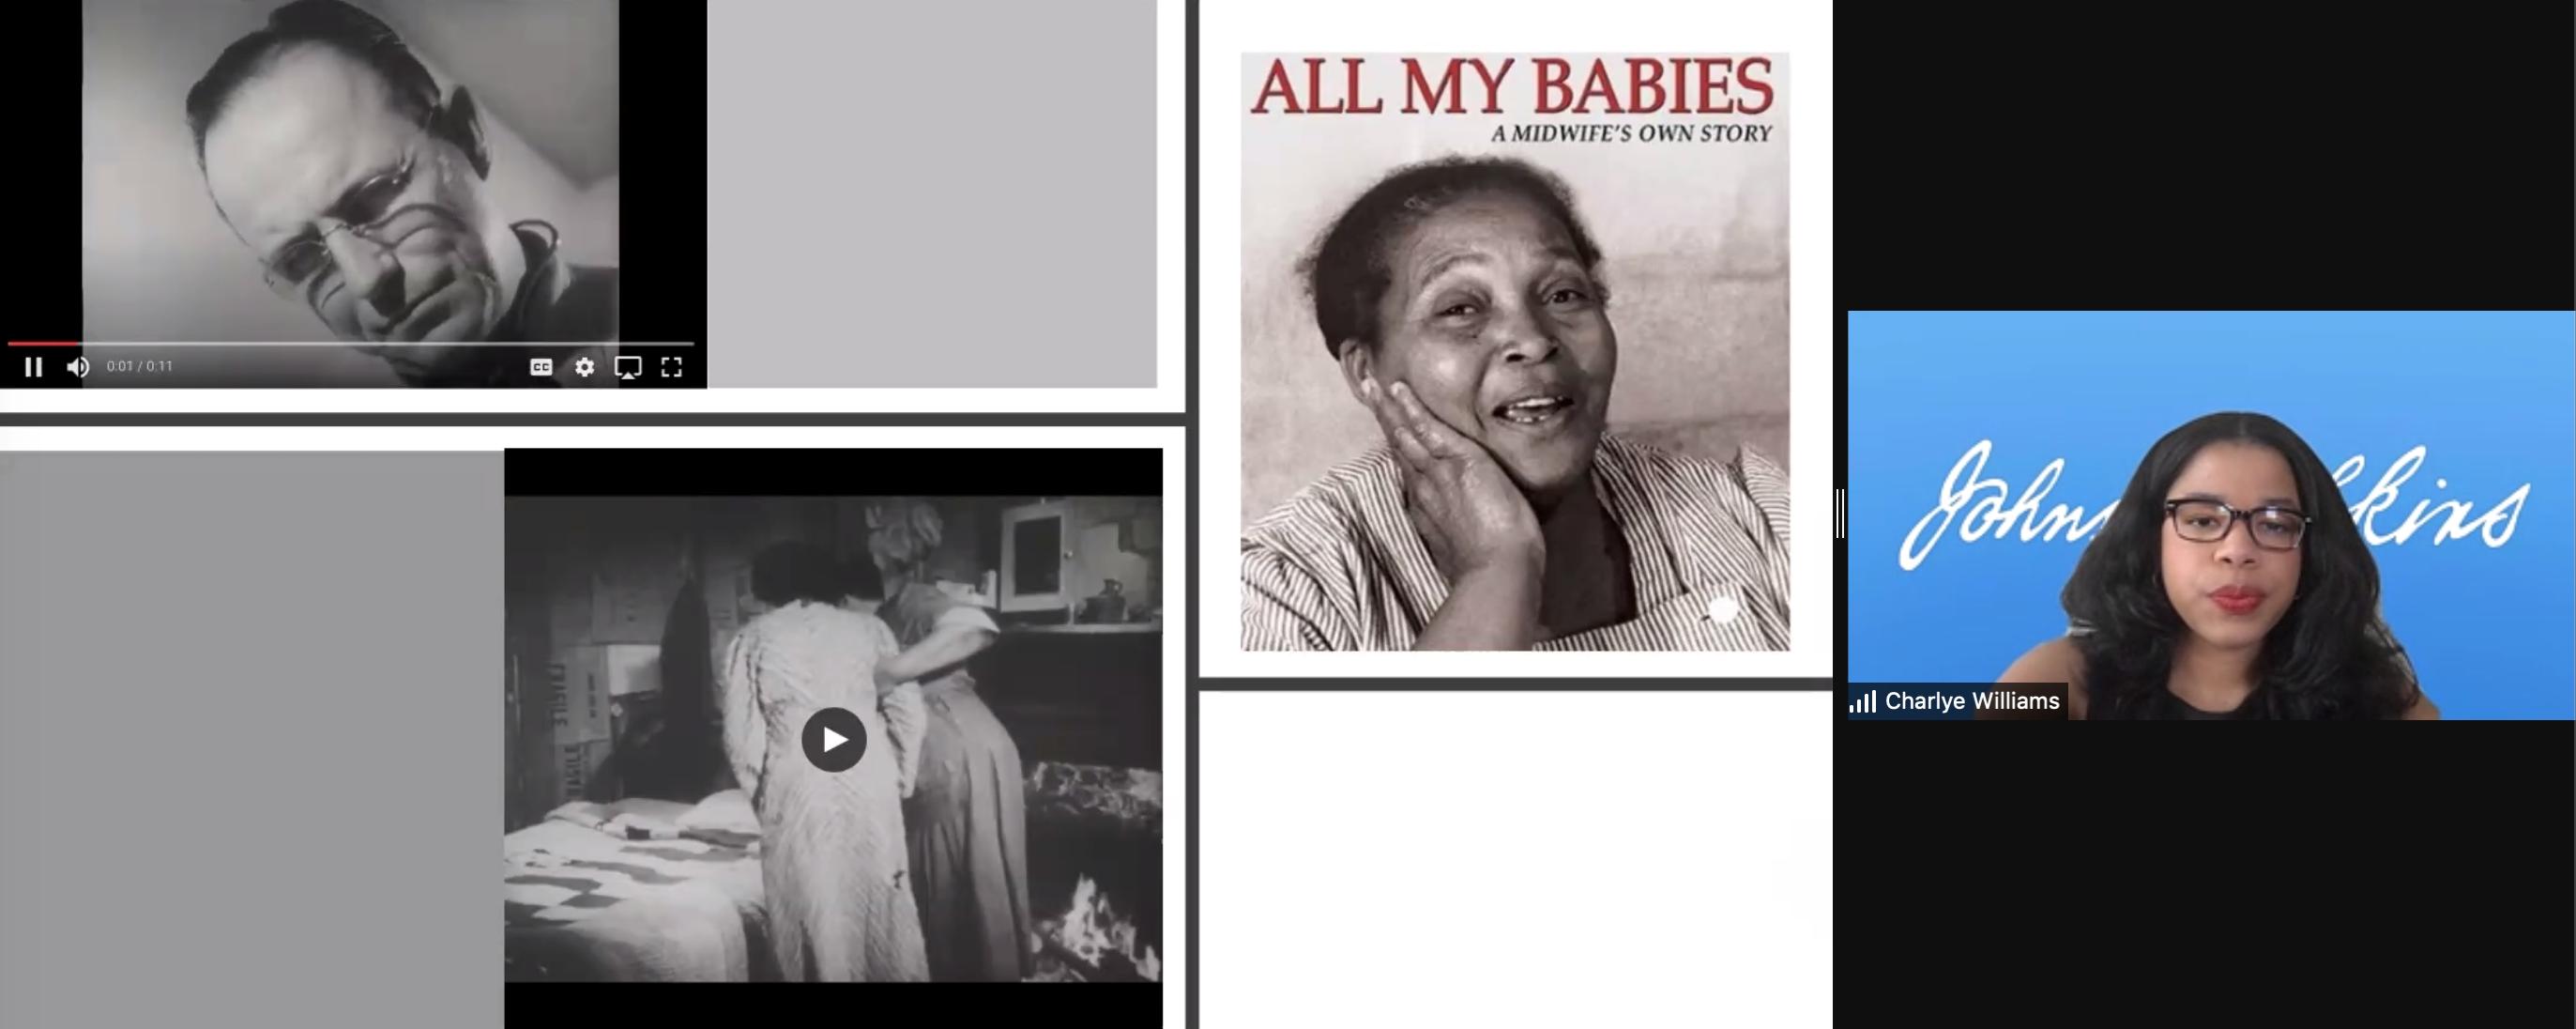 Charlye Wiliams Presentation Screenshot - All My Babies